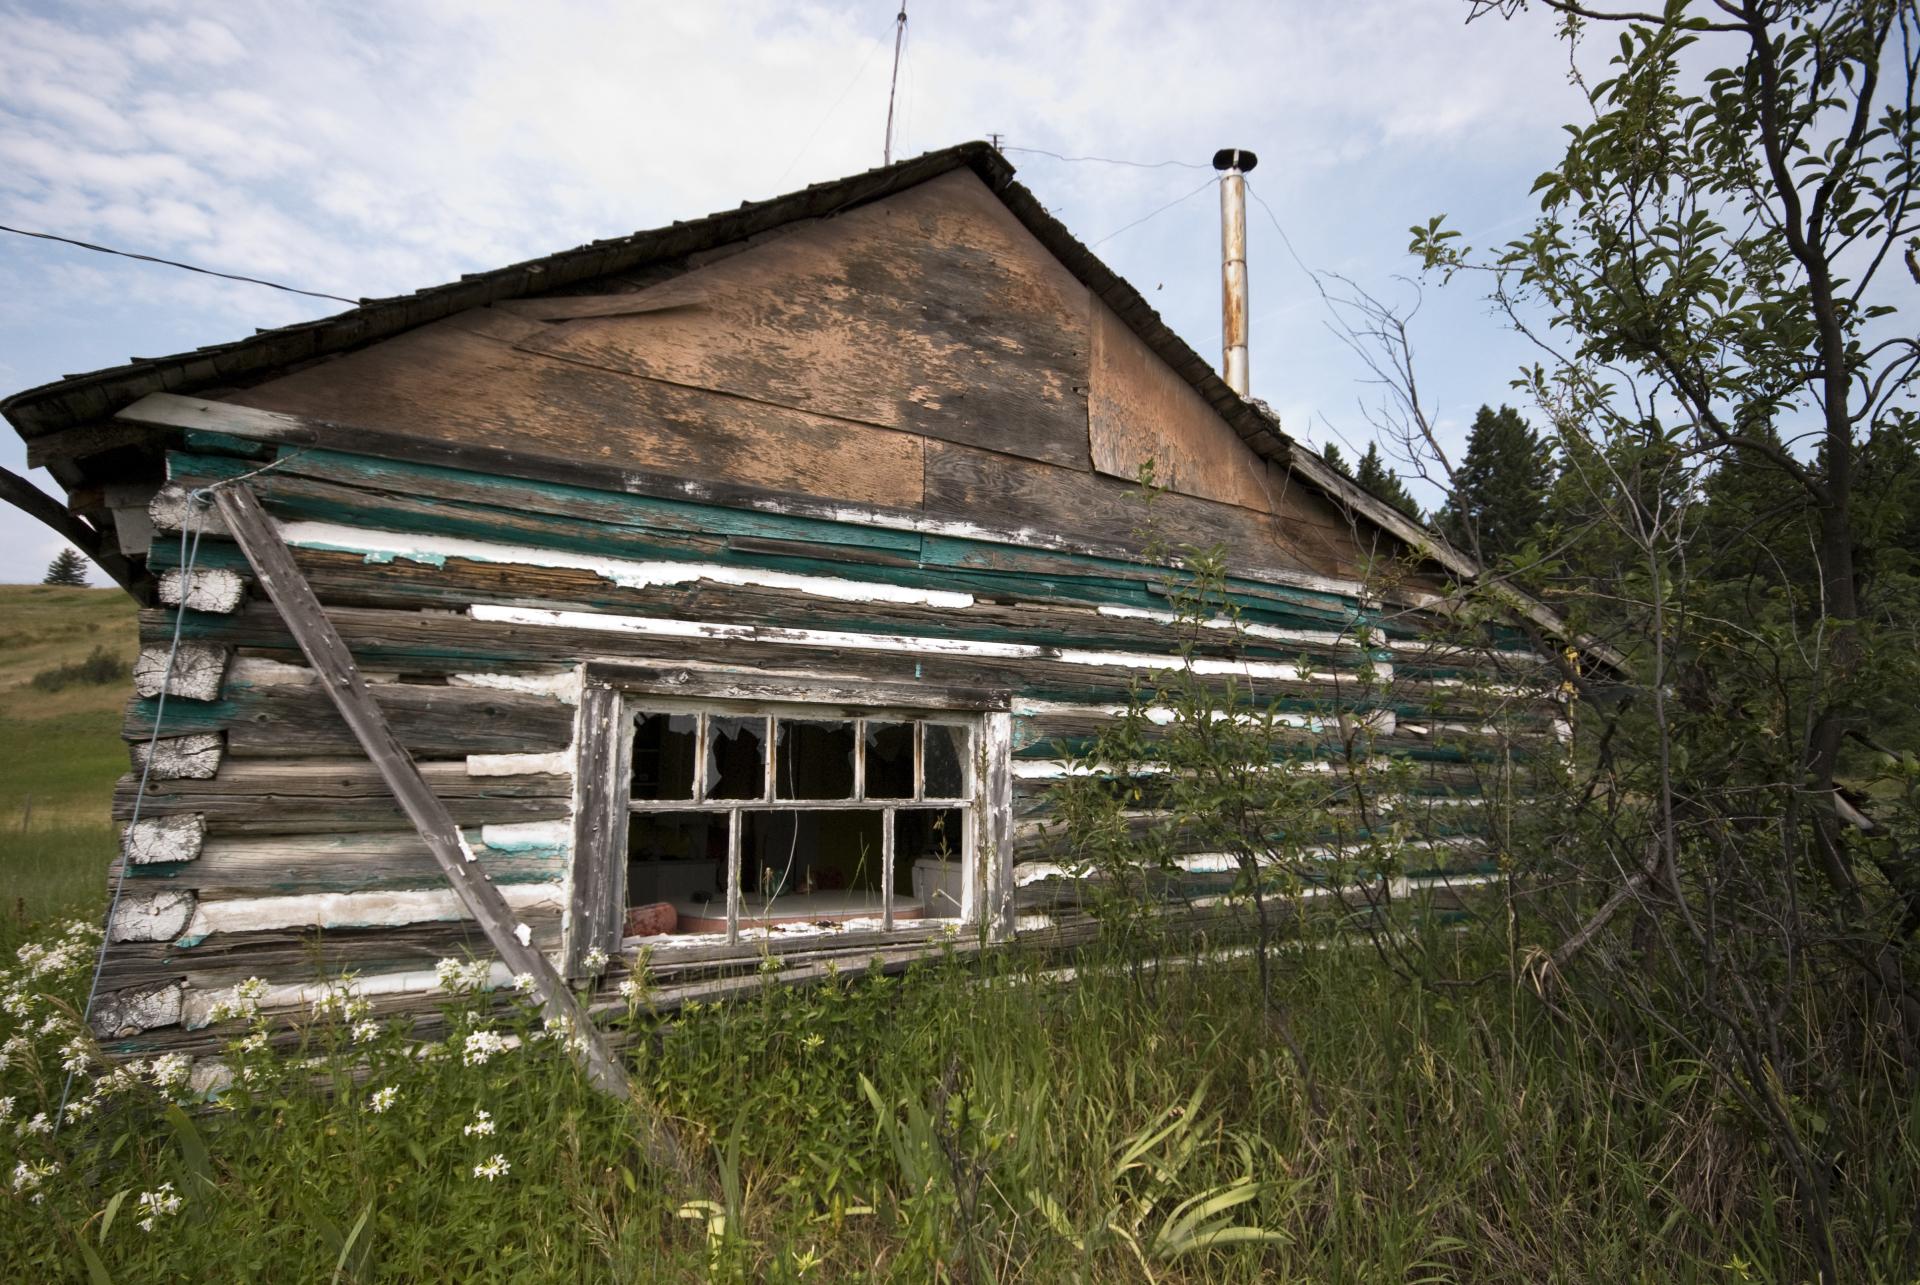 Outside of the Abandoned House